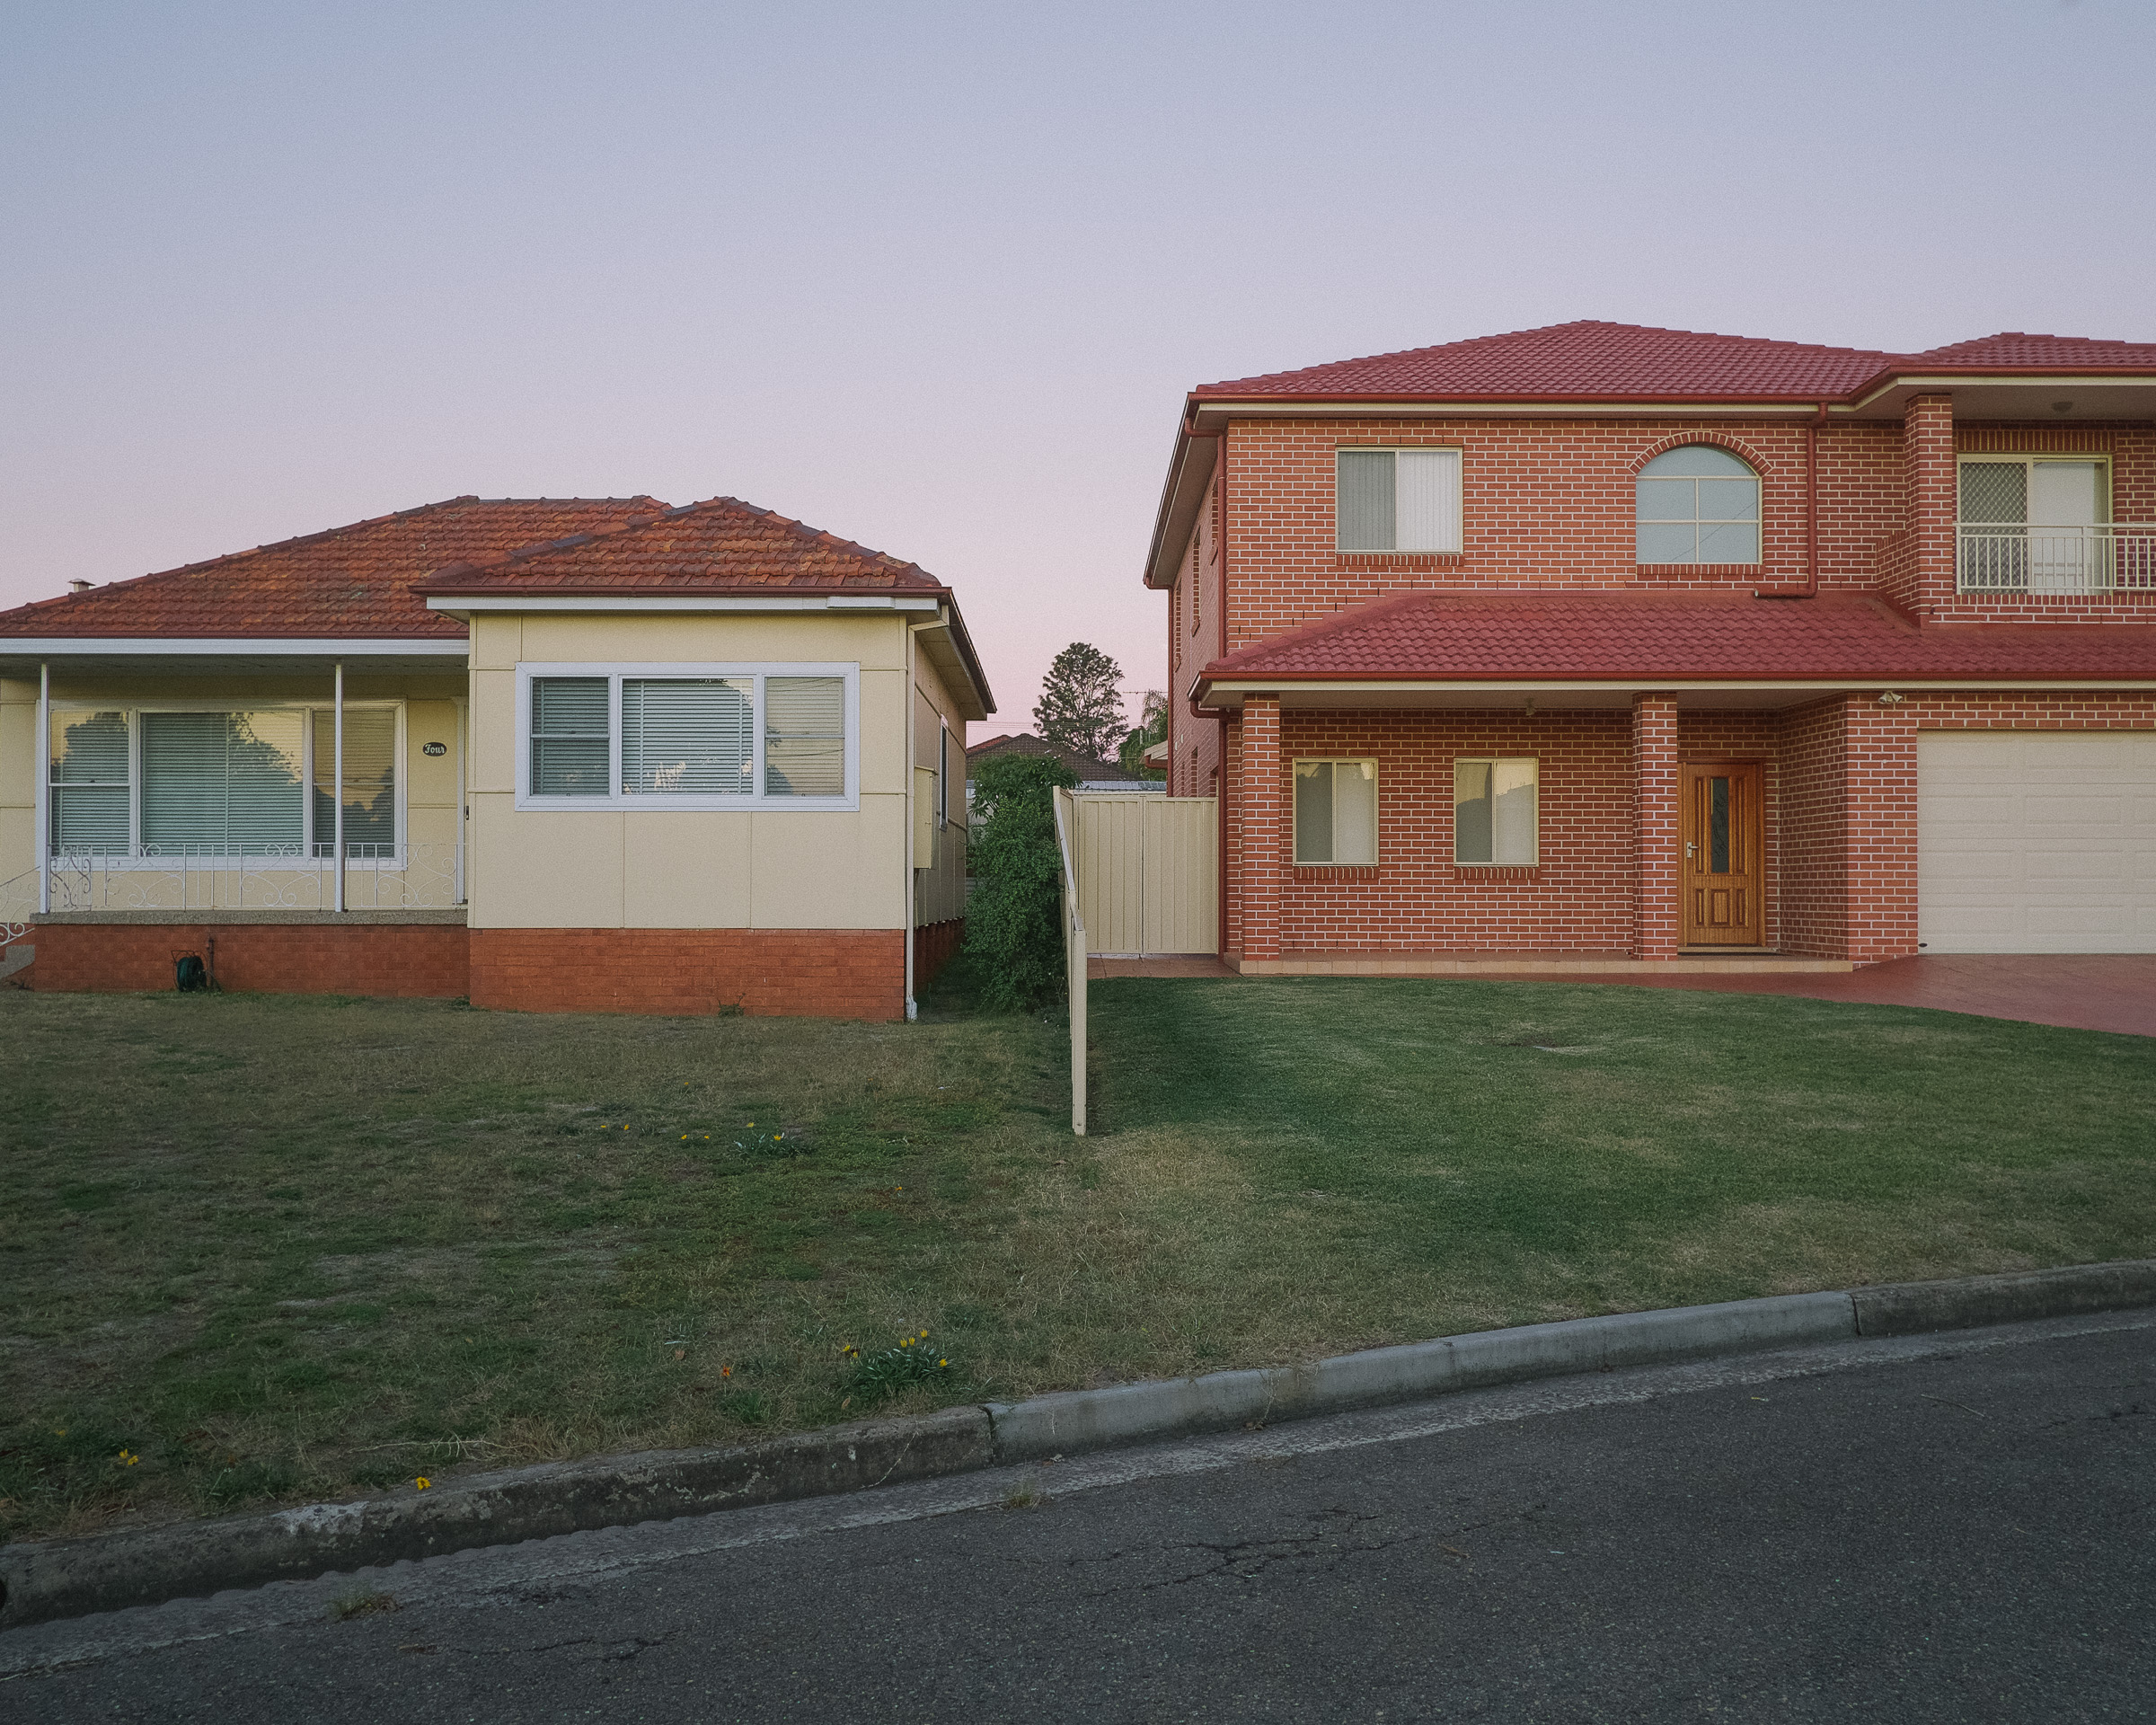 ids_suburbia-01-11.jpg